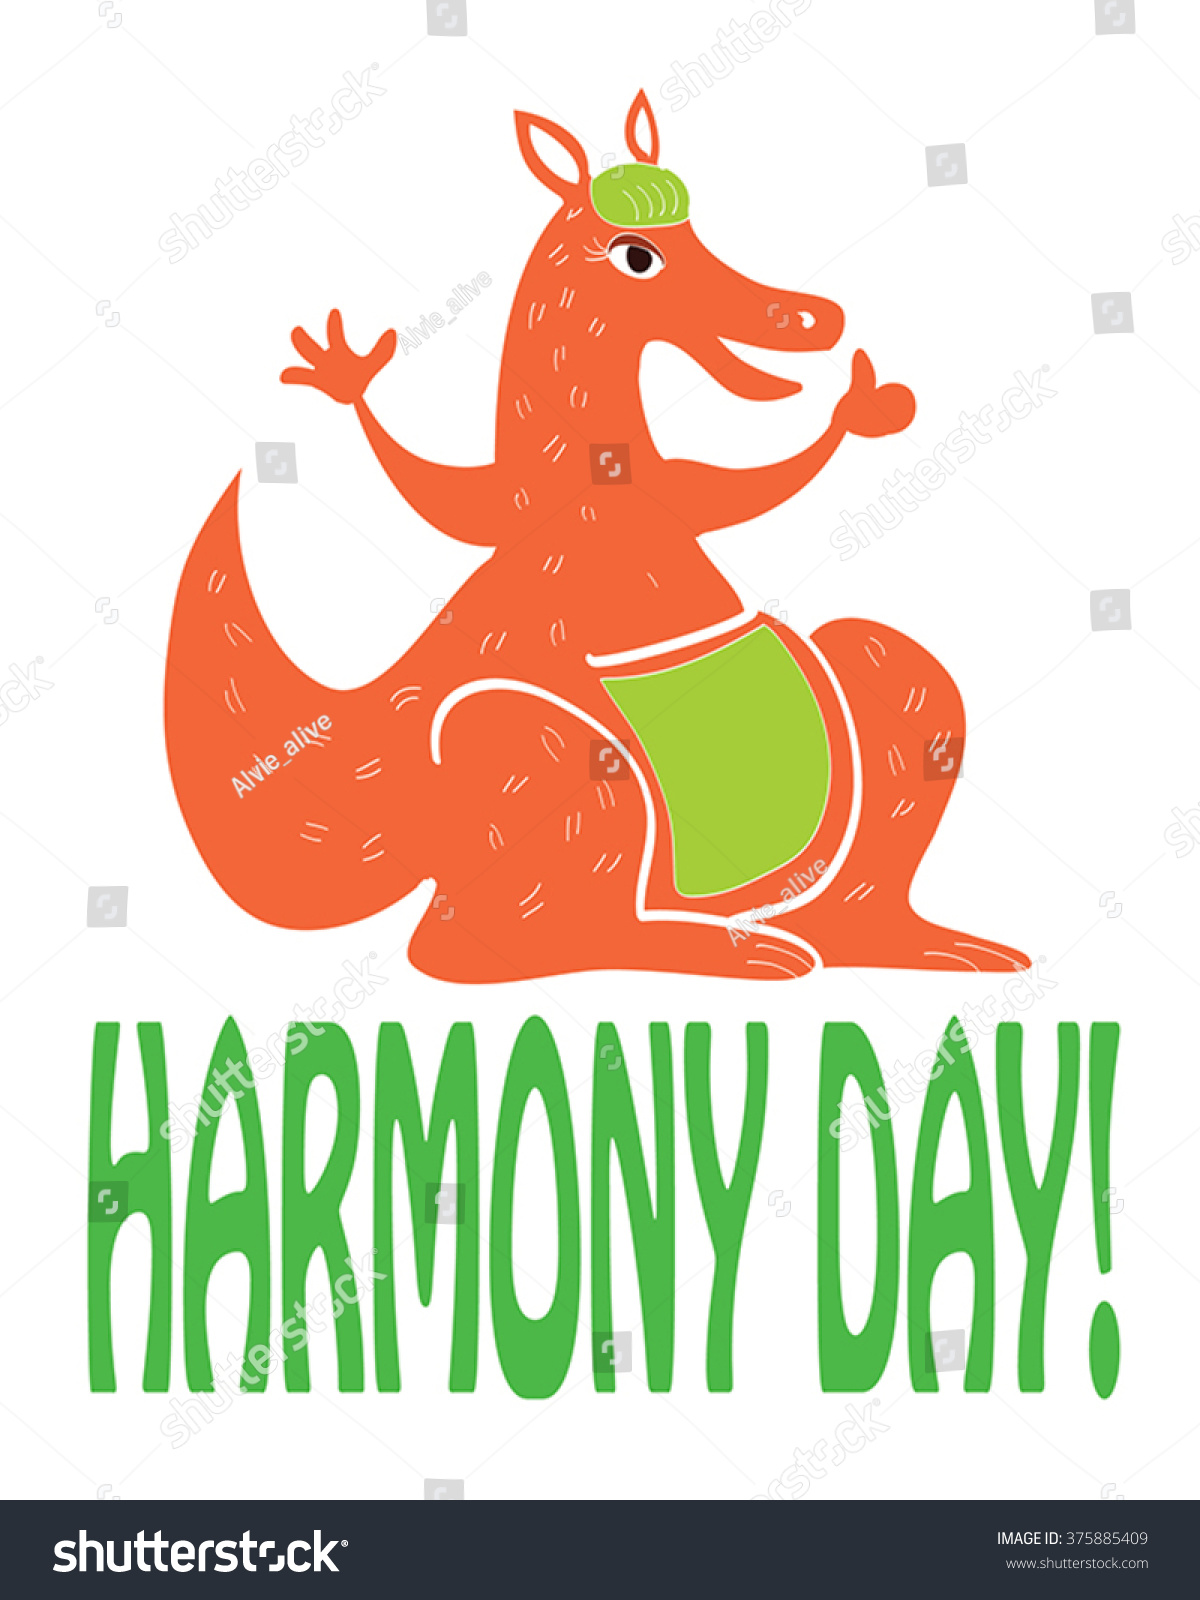 Harmony Day Australia Funny Greeting Card Stock Vector Royalty Free